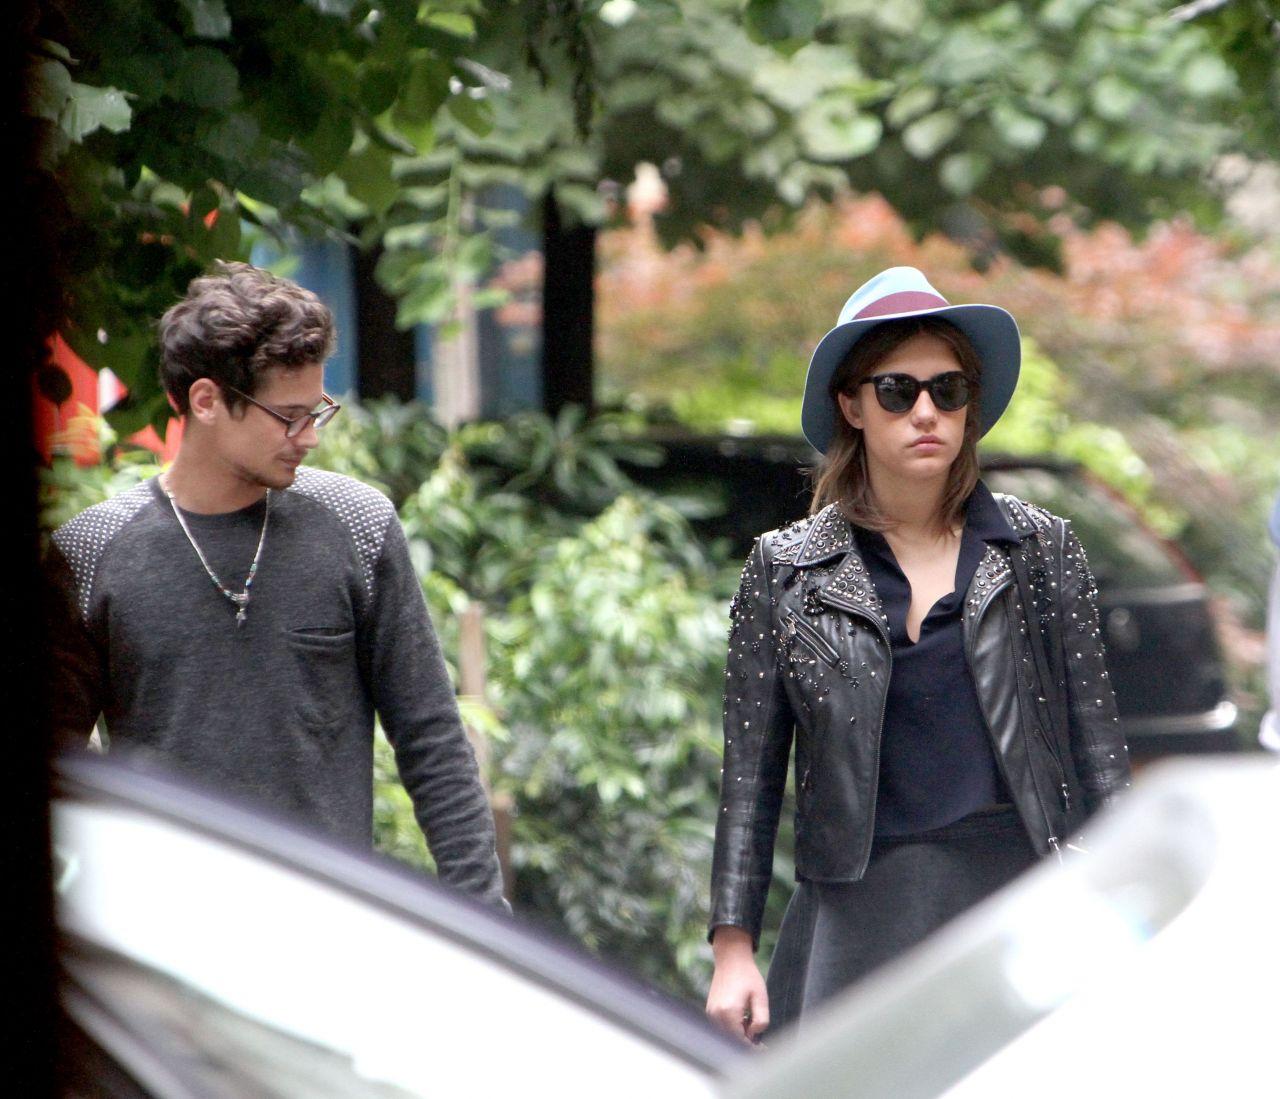 Adele Exarchopoulos Ki... Nicole Scherzinger Boyfriend List